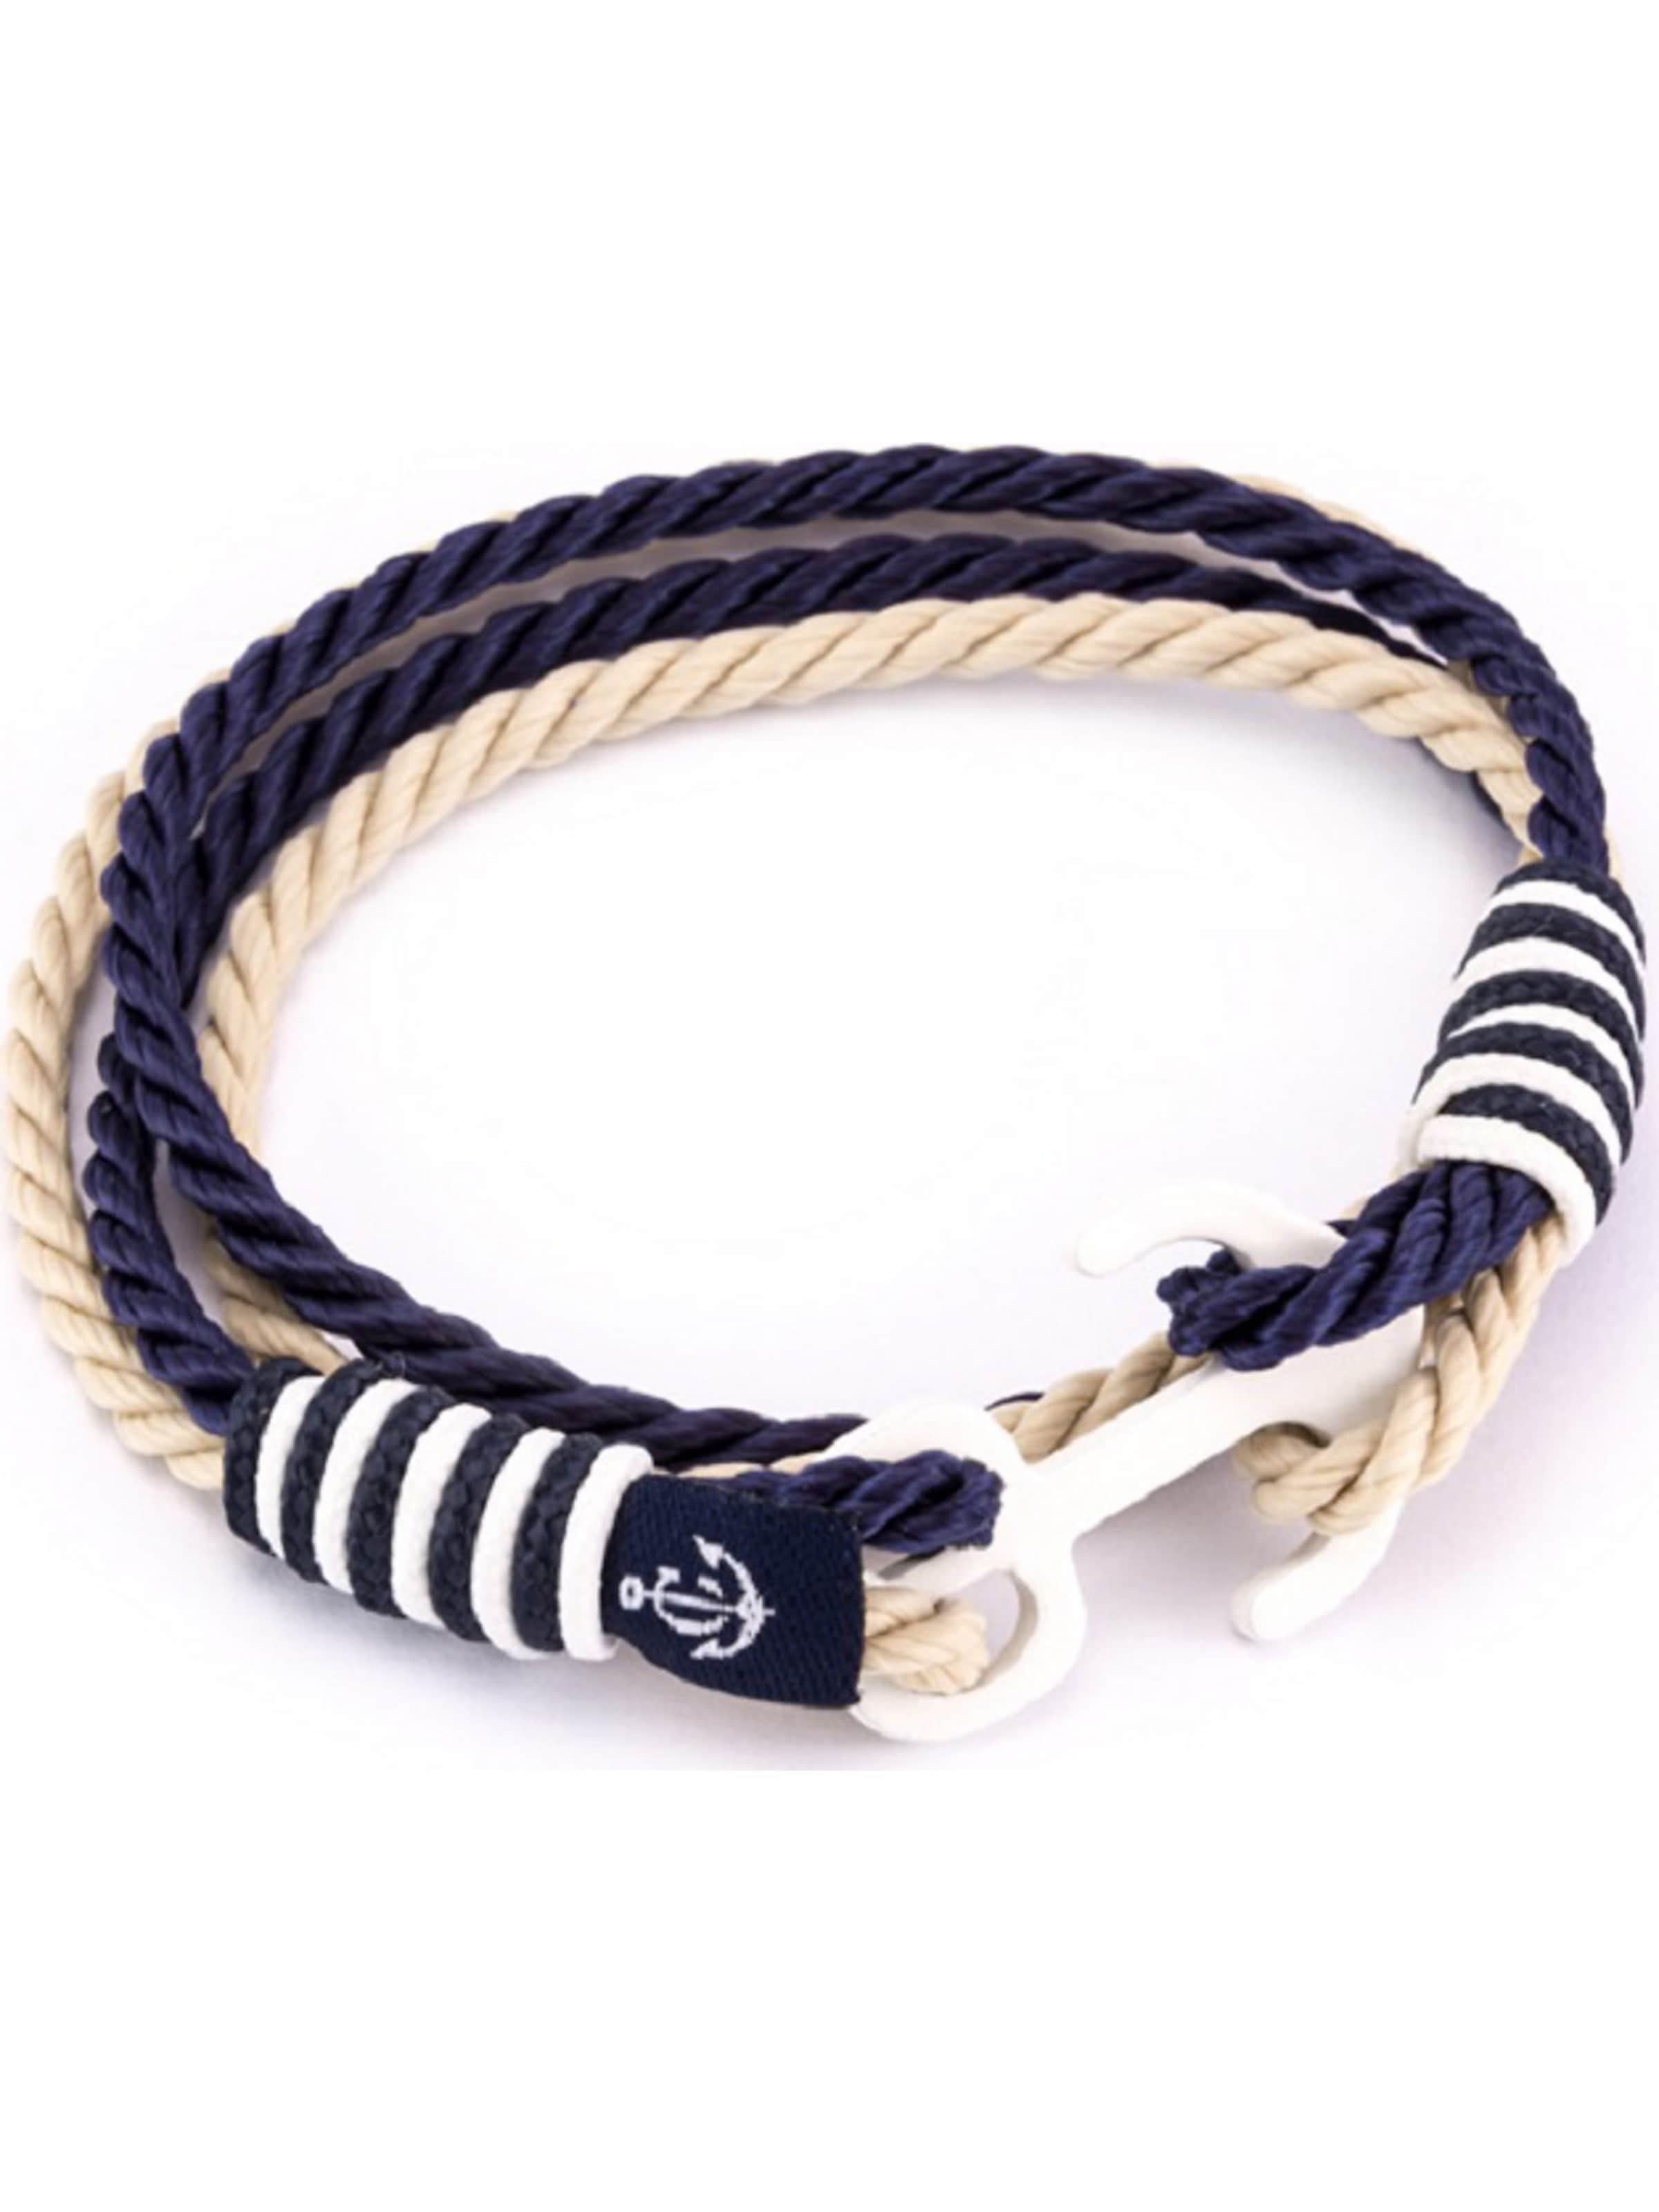 Armband BeigeNachtblau Weiß Nautics In Constantin 3qcSA5j4RL